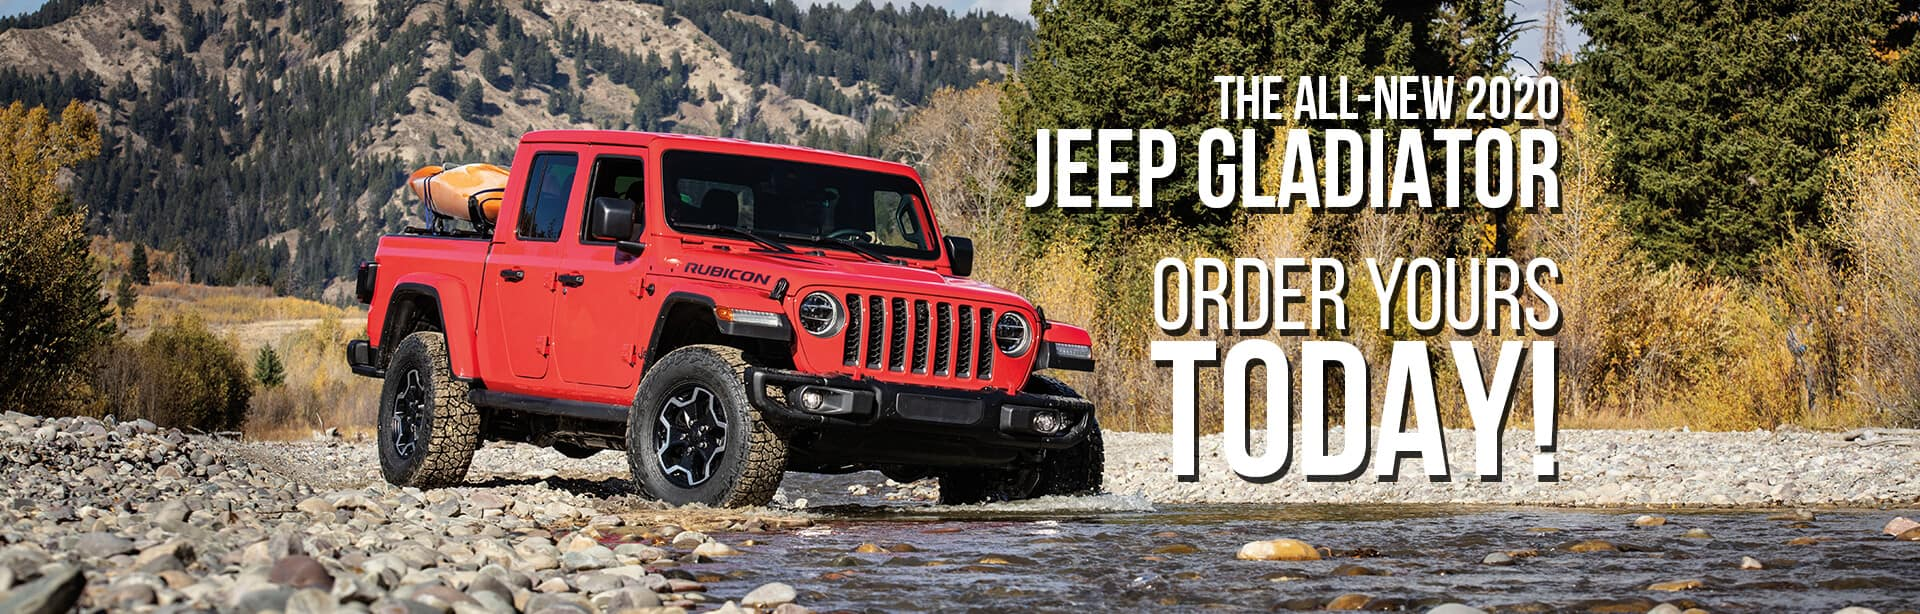 Jeep Gladiator Inventory near Terre Haute, Indiana.